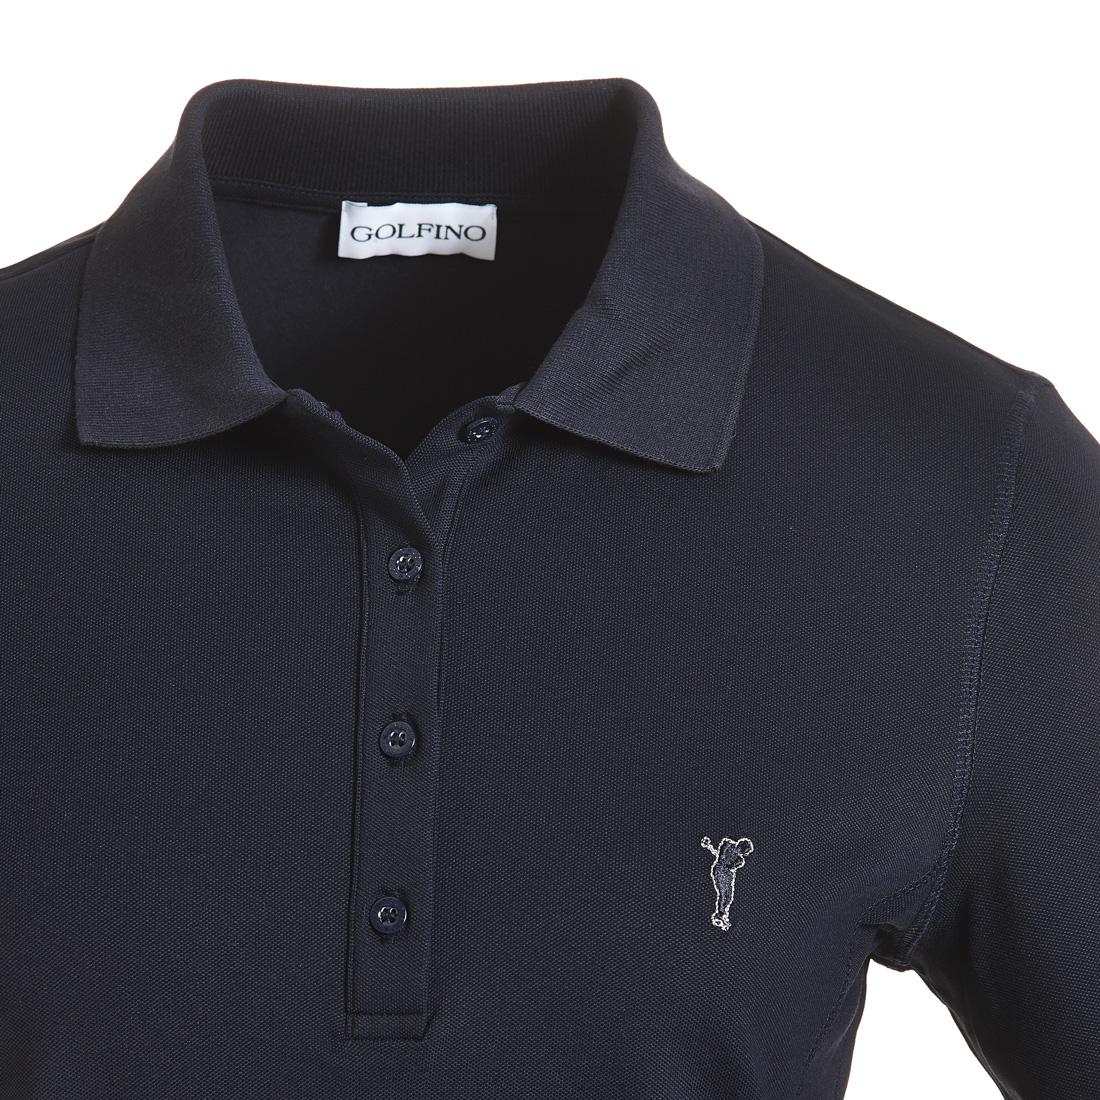 Damen Golf Poloshirt Sun Protection in Slim Fit